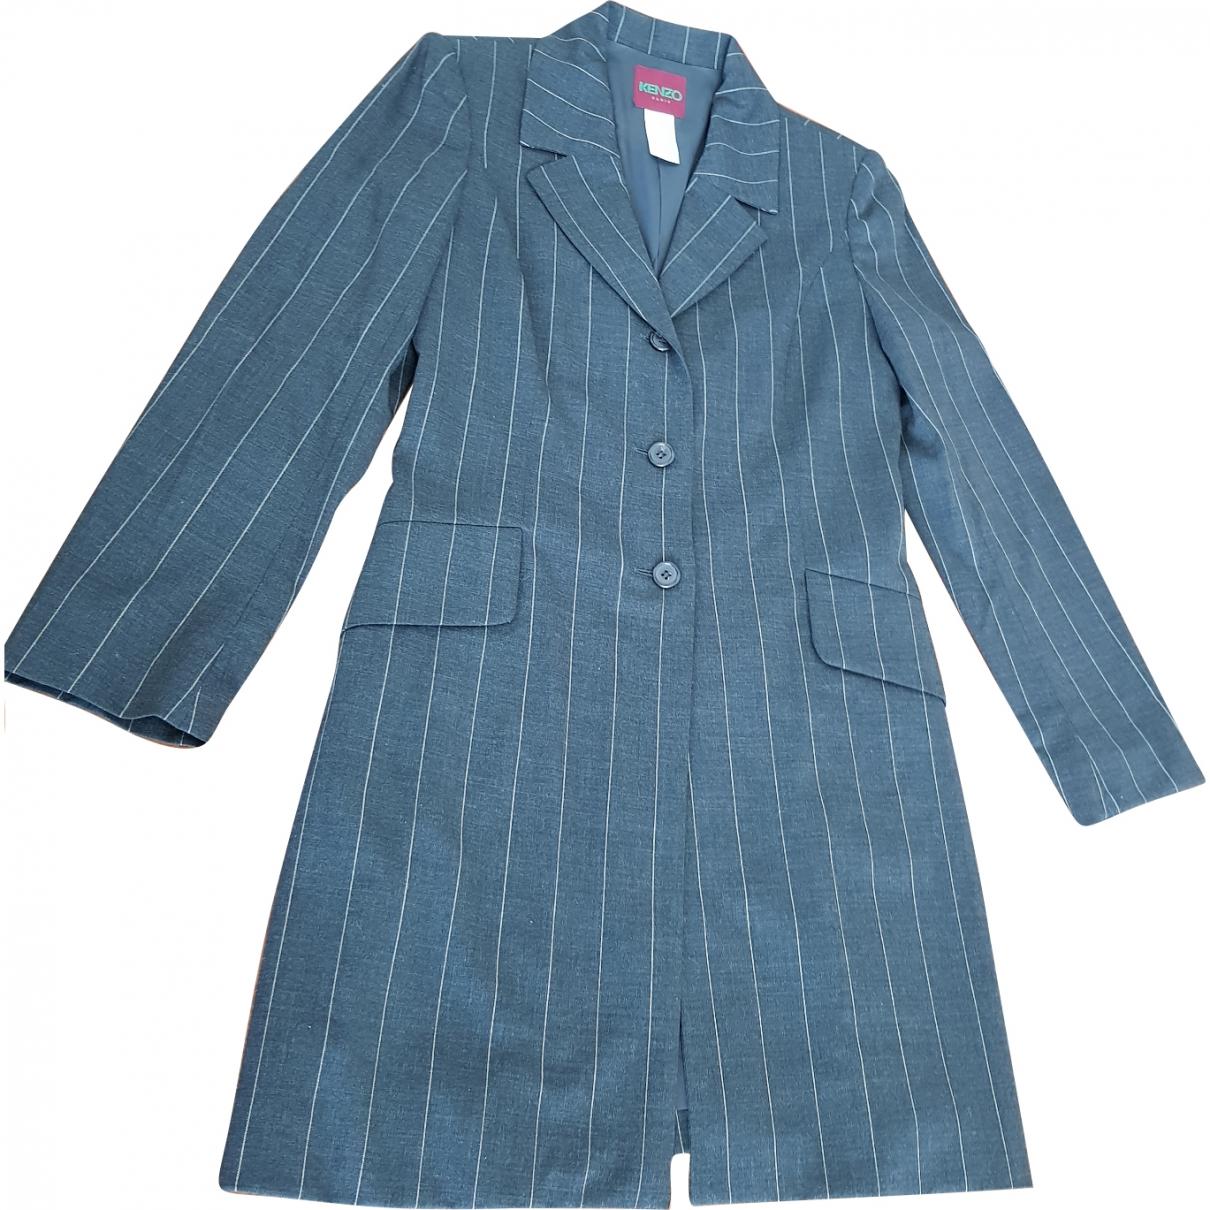 Kenzo \N Grey Wool jacket for Women 36 FR